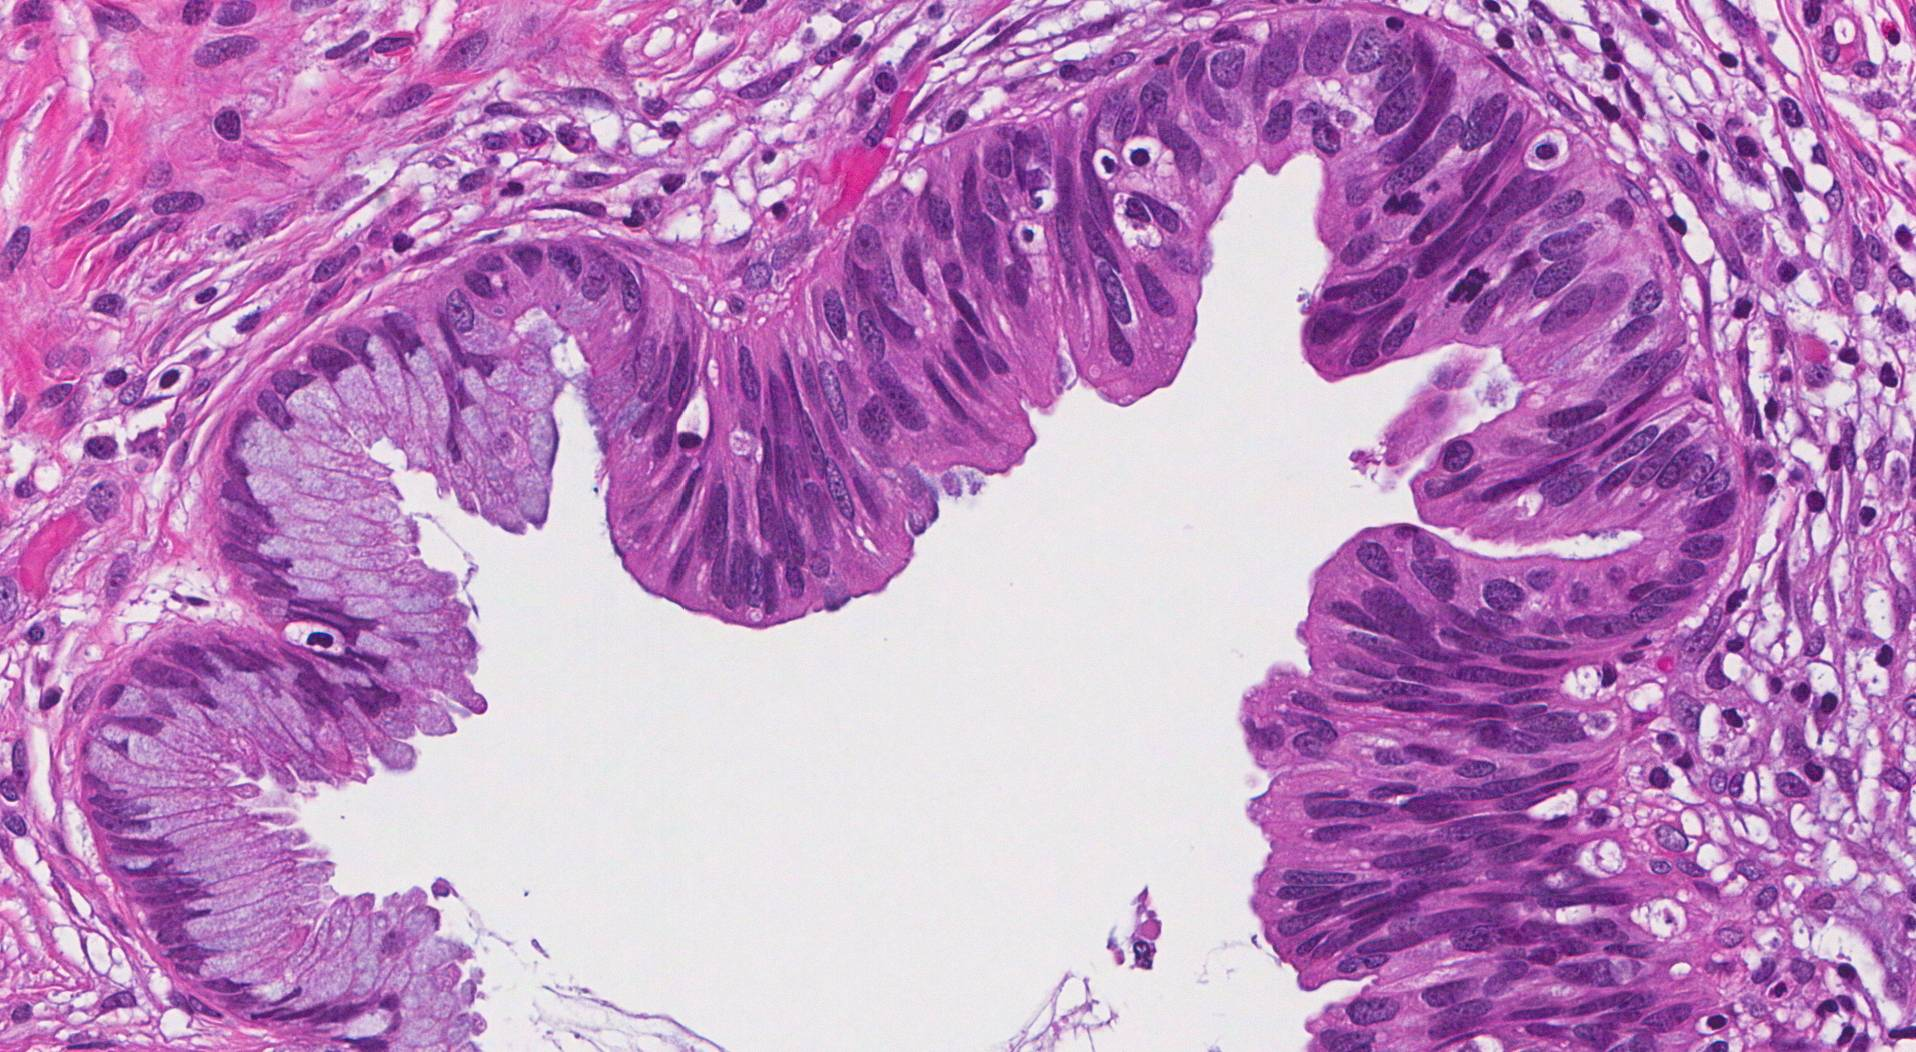 adenocarcinoma in situ cervix